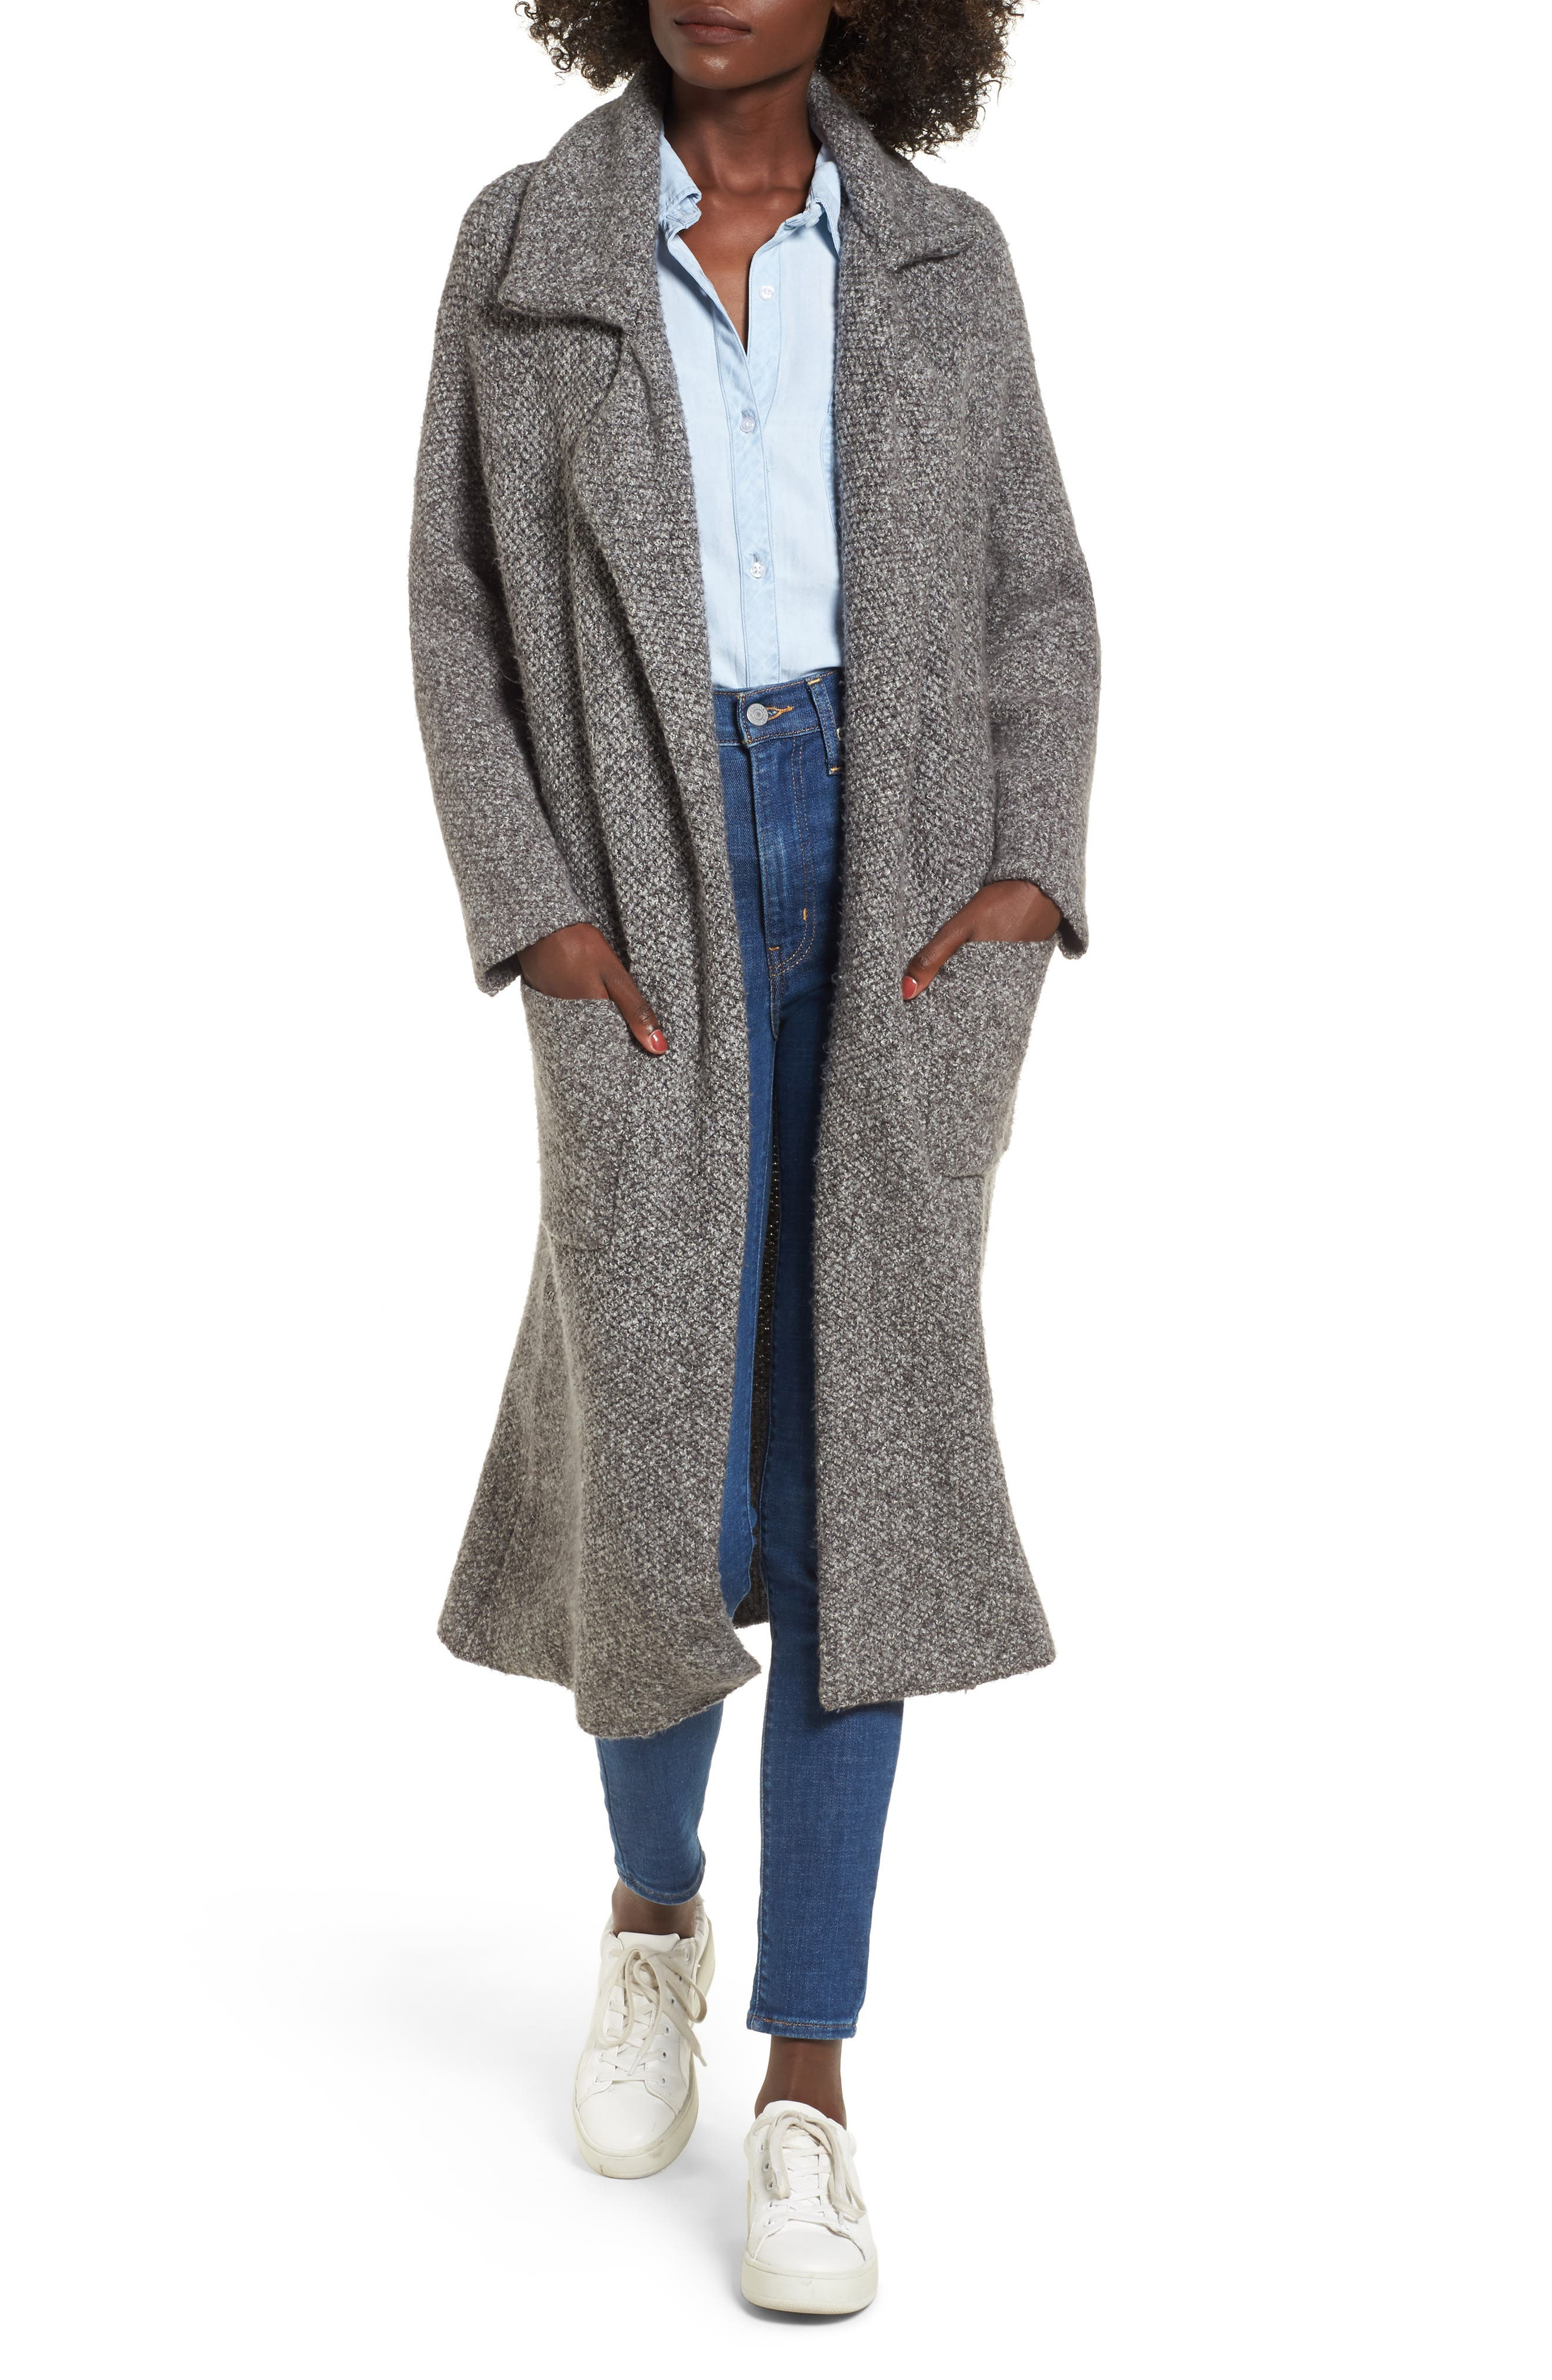 Kala Knit Sweater Jacket,                             Main thumbnail 1, color,                             030